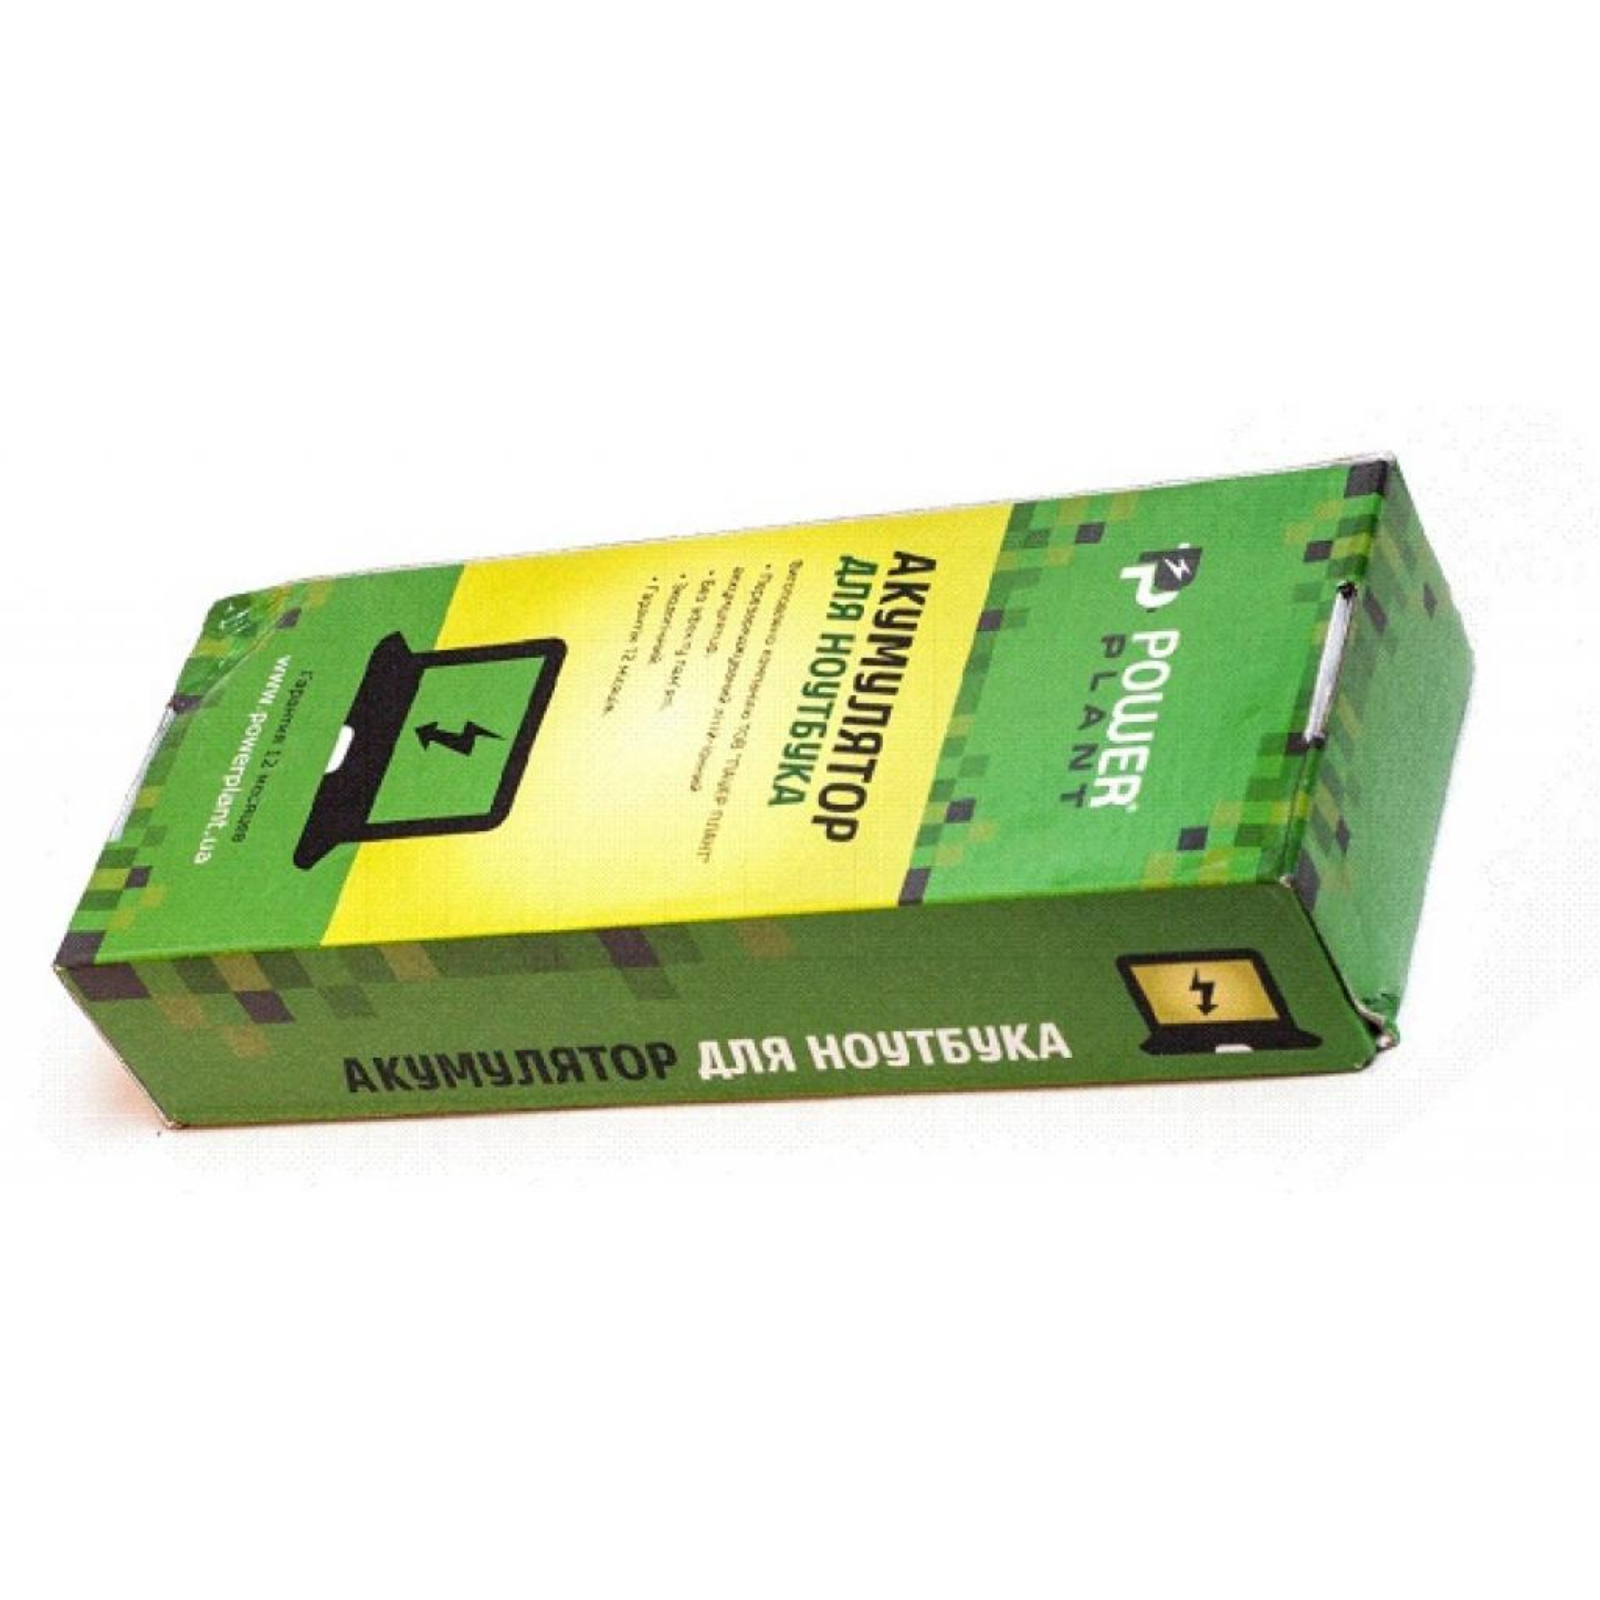 Аккумулятор для ноутбука ASUS EEE PC105 (A32-1015, AS1015LH) 10.8V 5200mAh PowerPlant (NB00000103) изображение 3